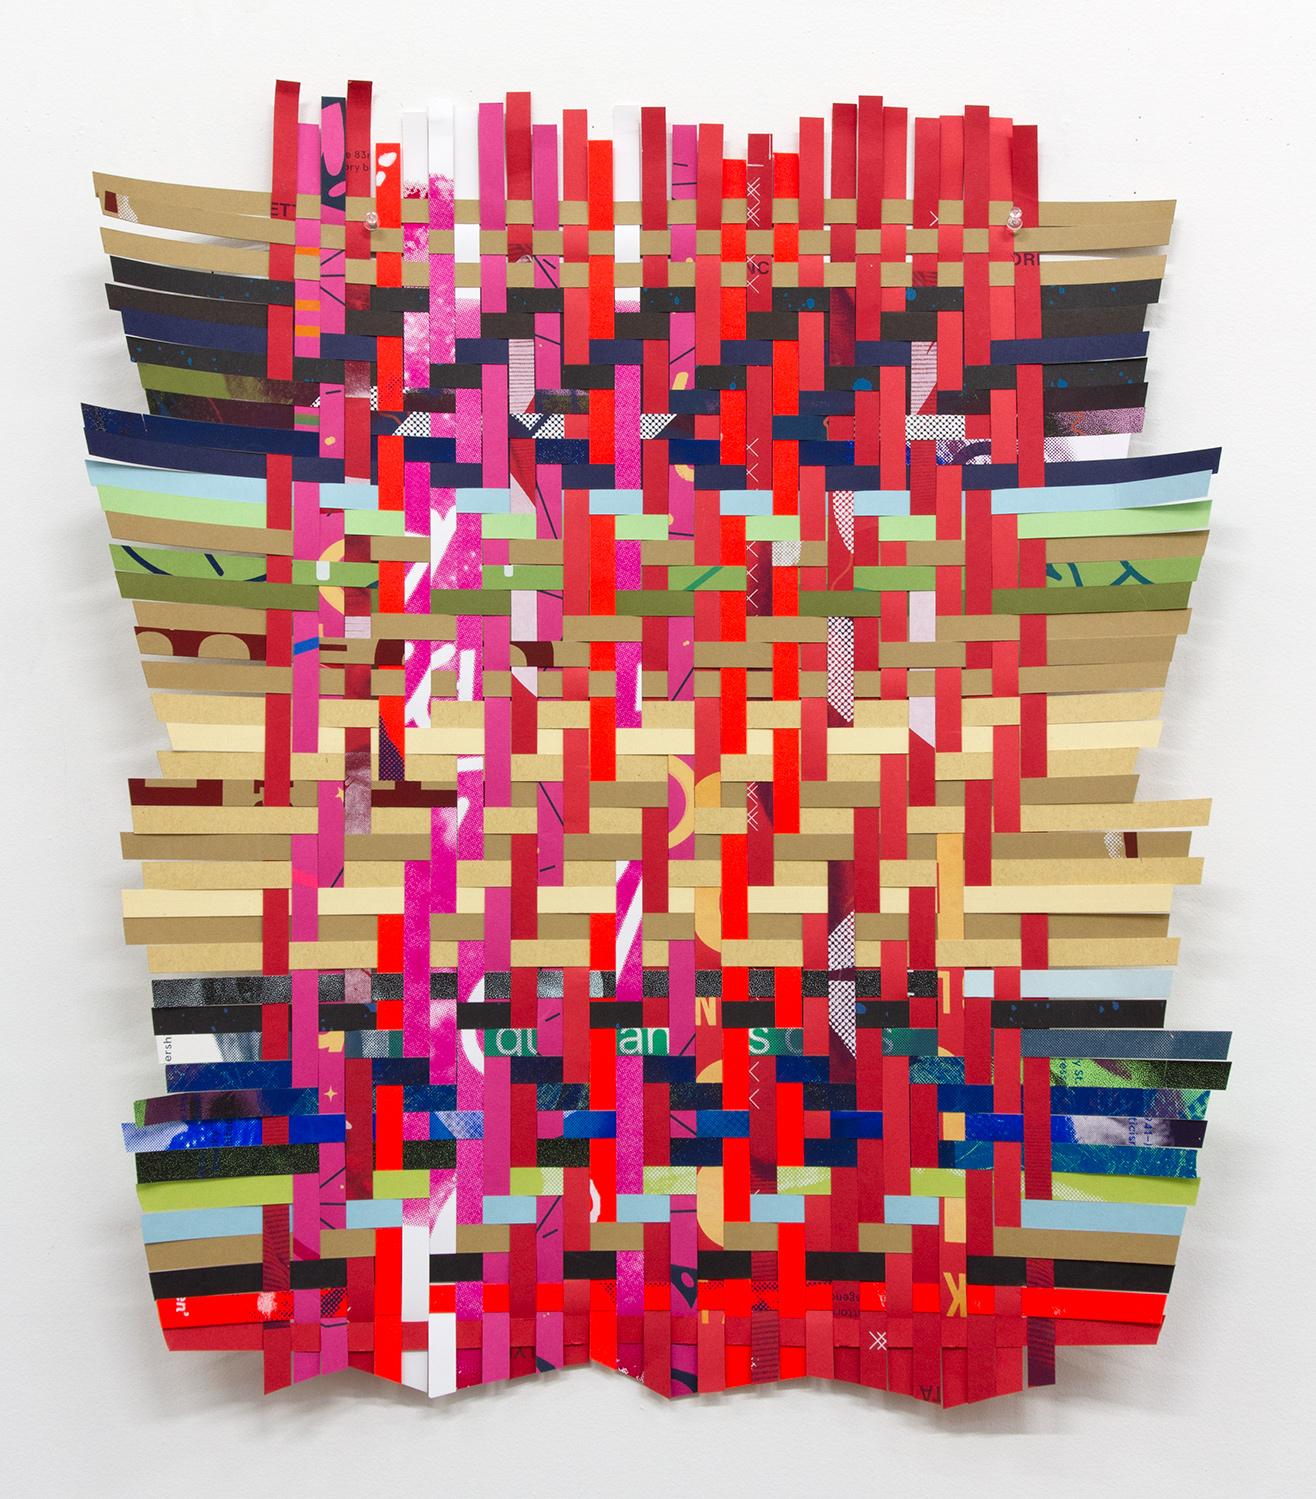 "ARL_006, 2017, woven Facebook silkscreen posters, 26 x 22.5"""